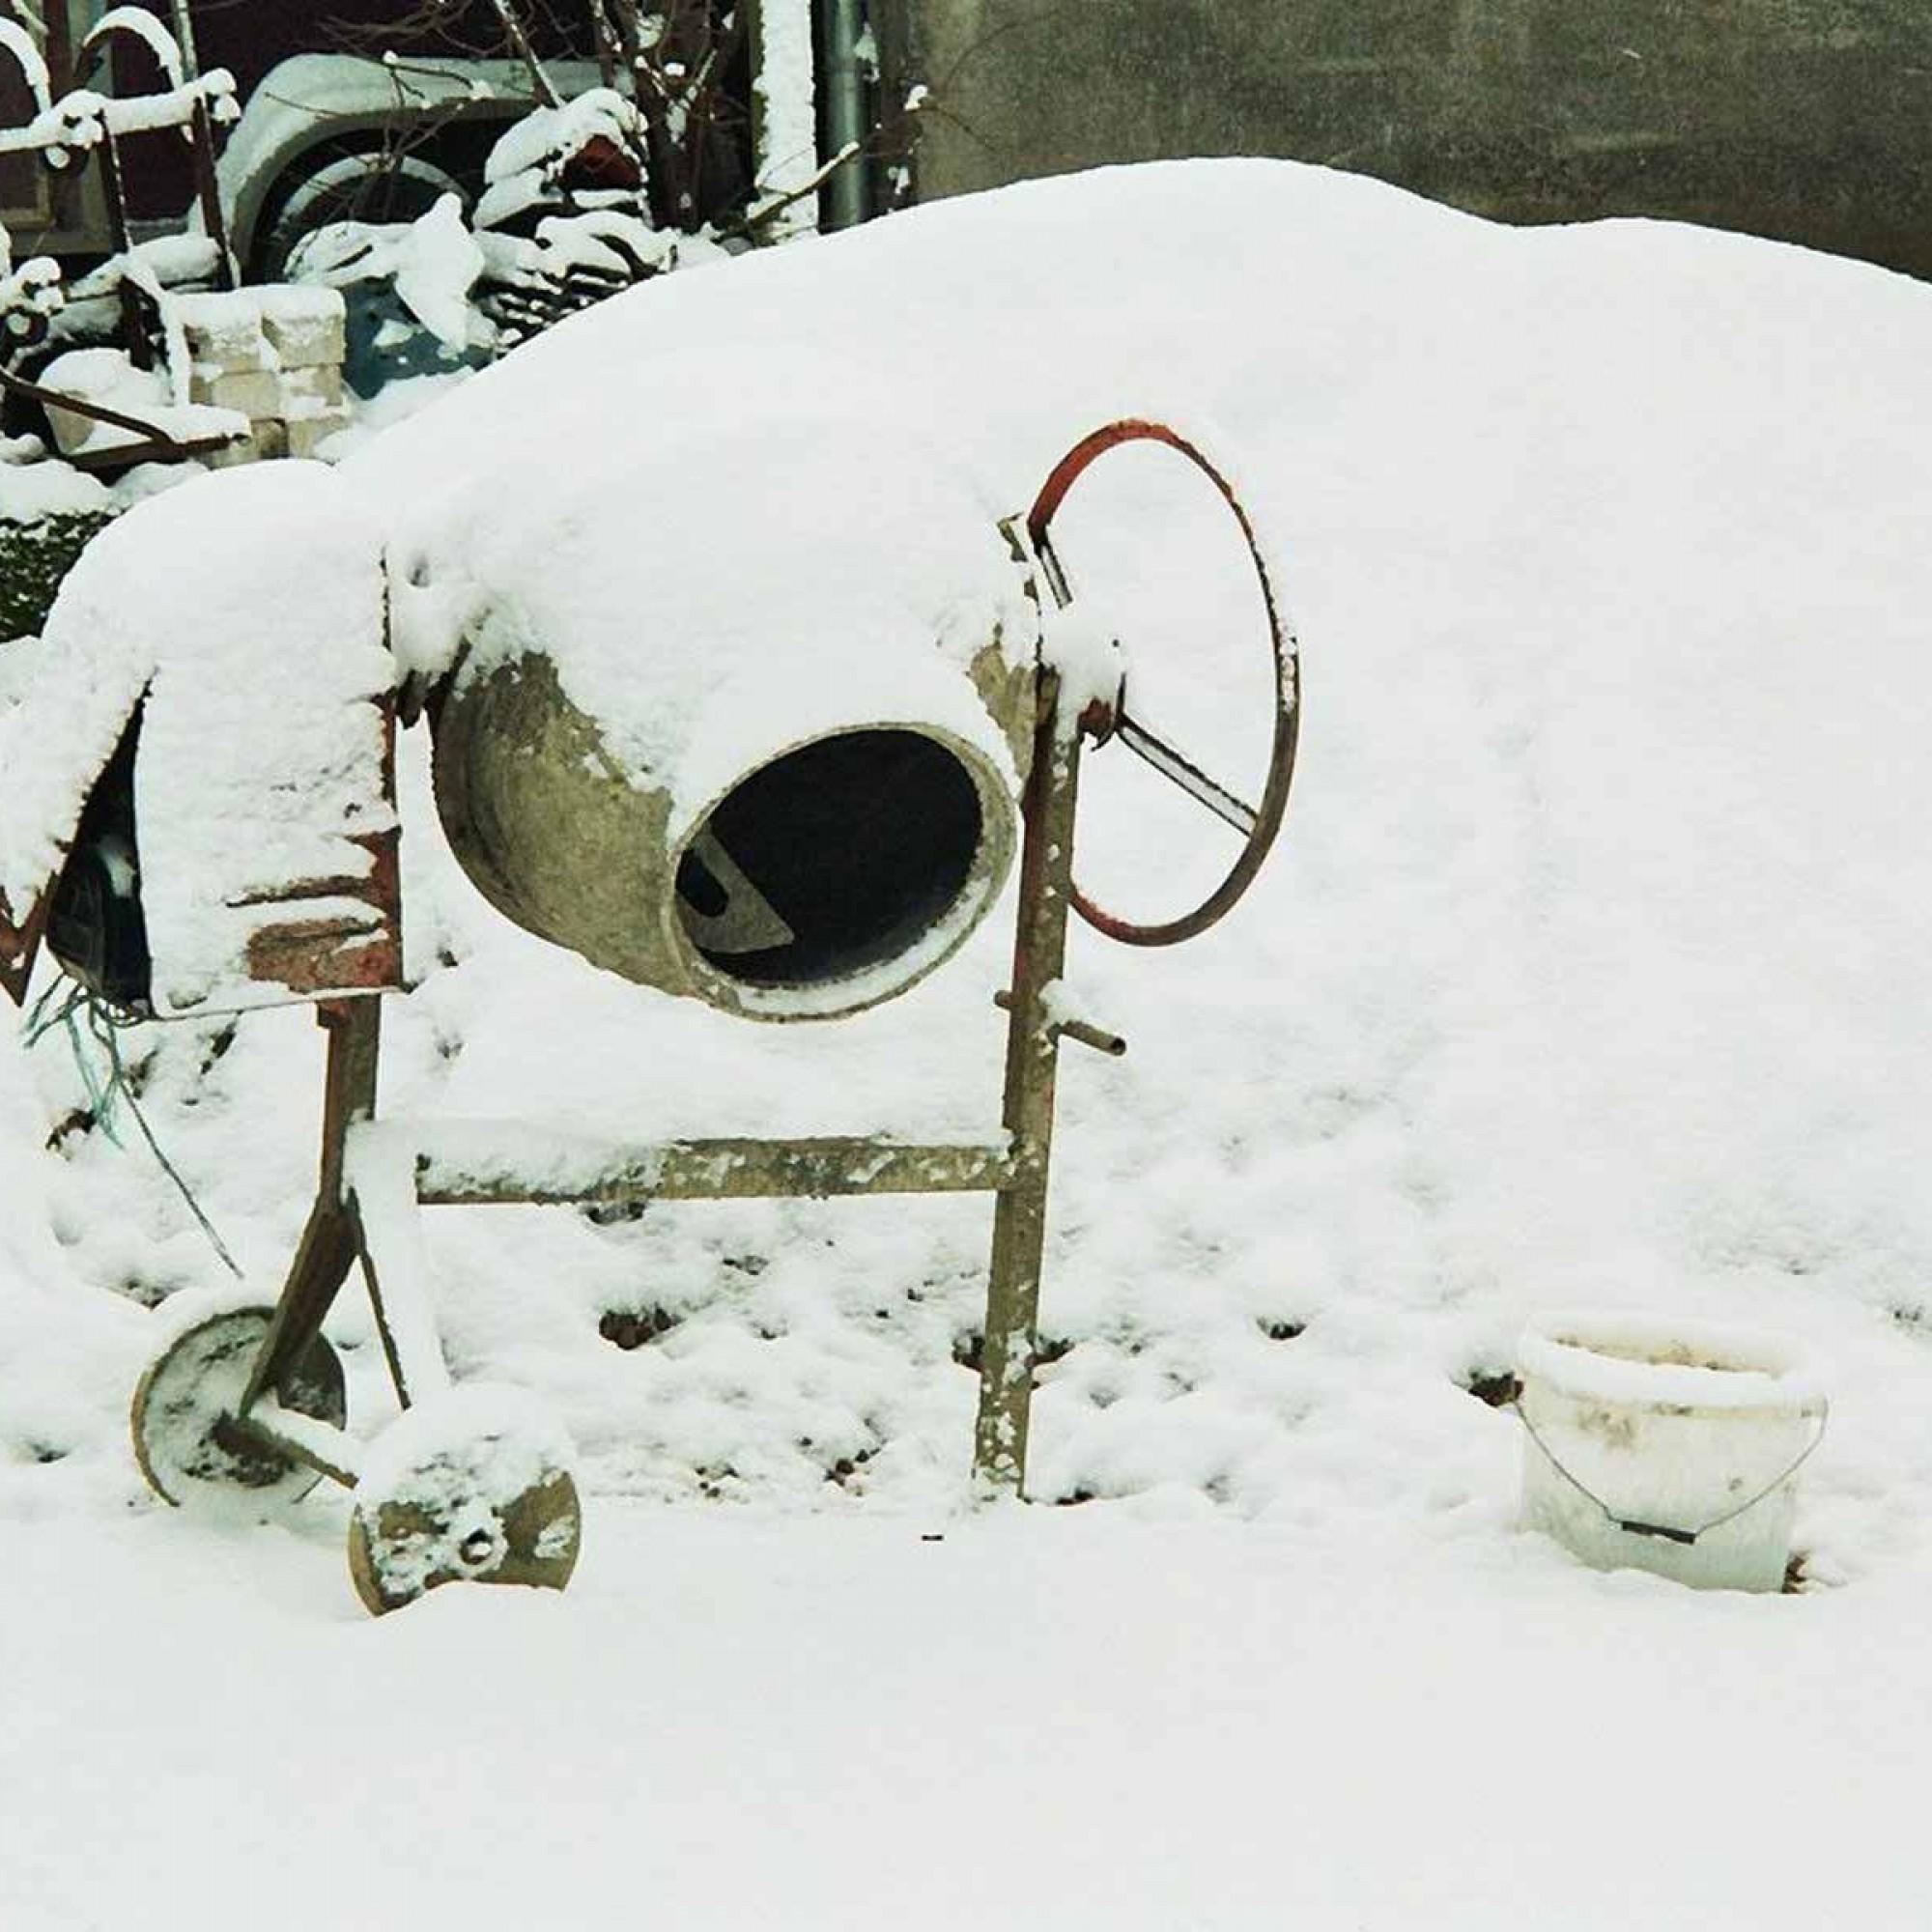 Betonmischer im Winter.